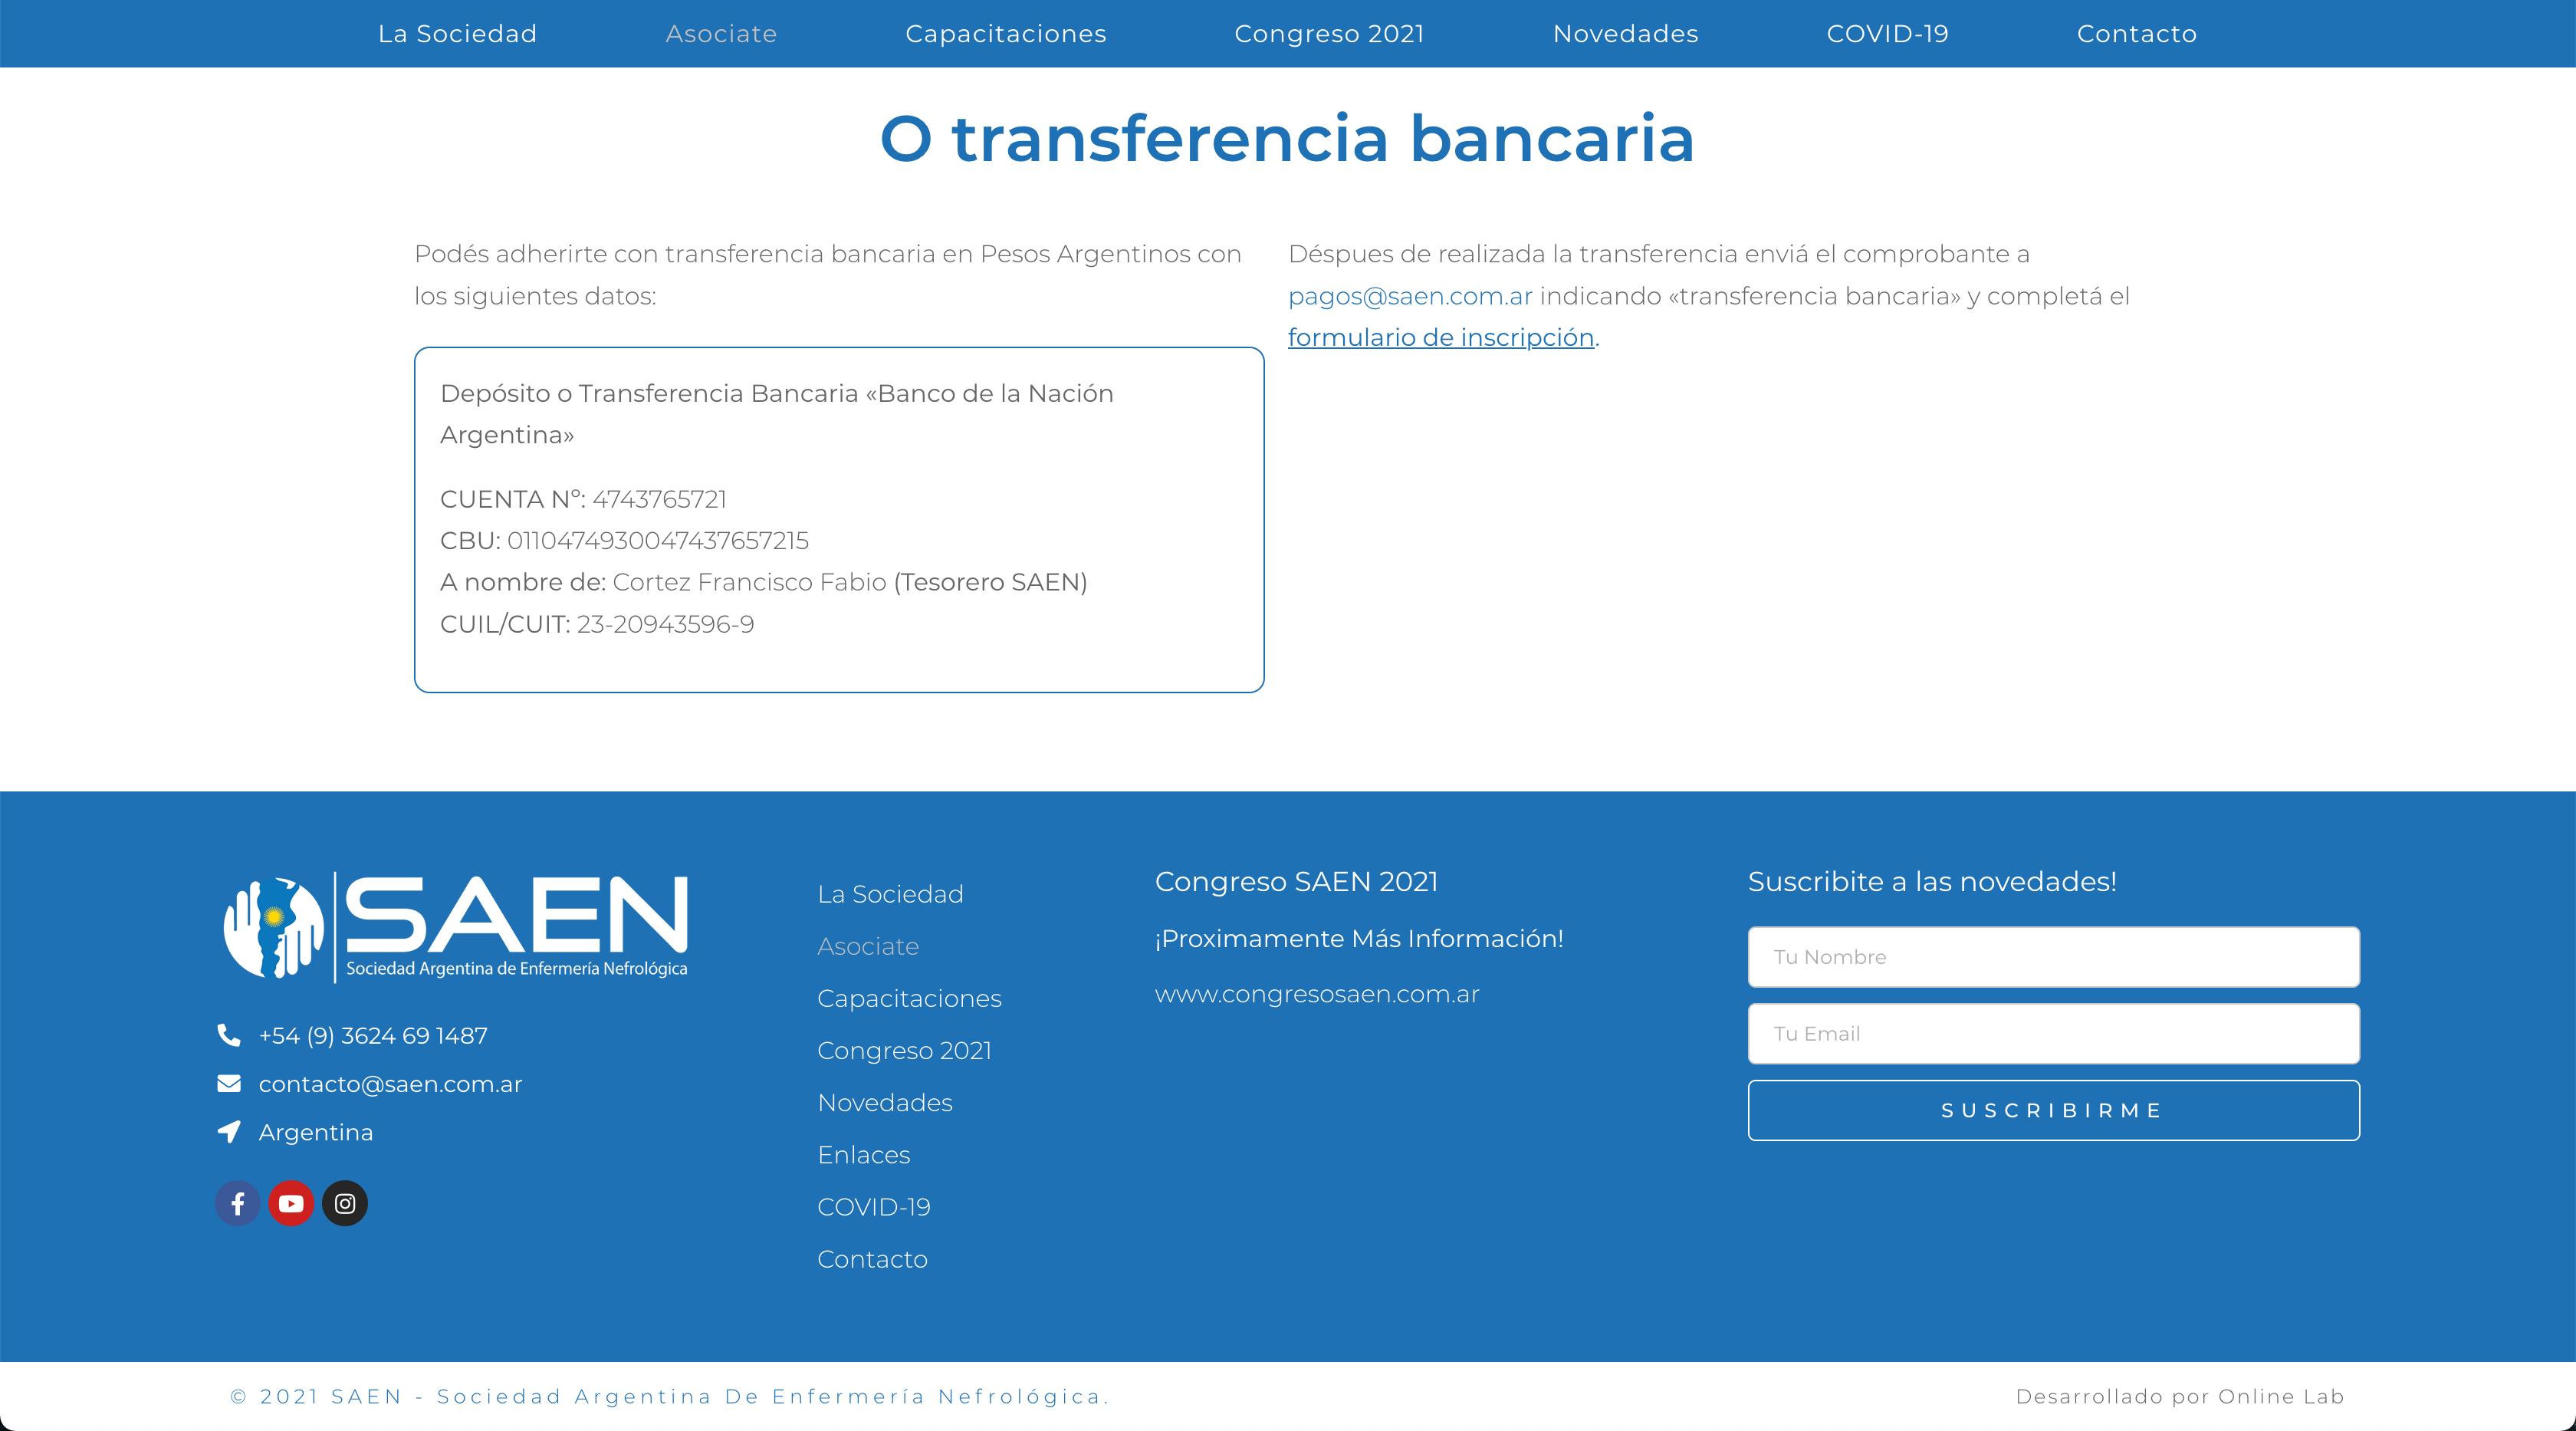 saen-sociedad-argentina-de-enfermeria-nefrologica-online-lab-web-development-web-design-7